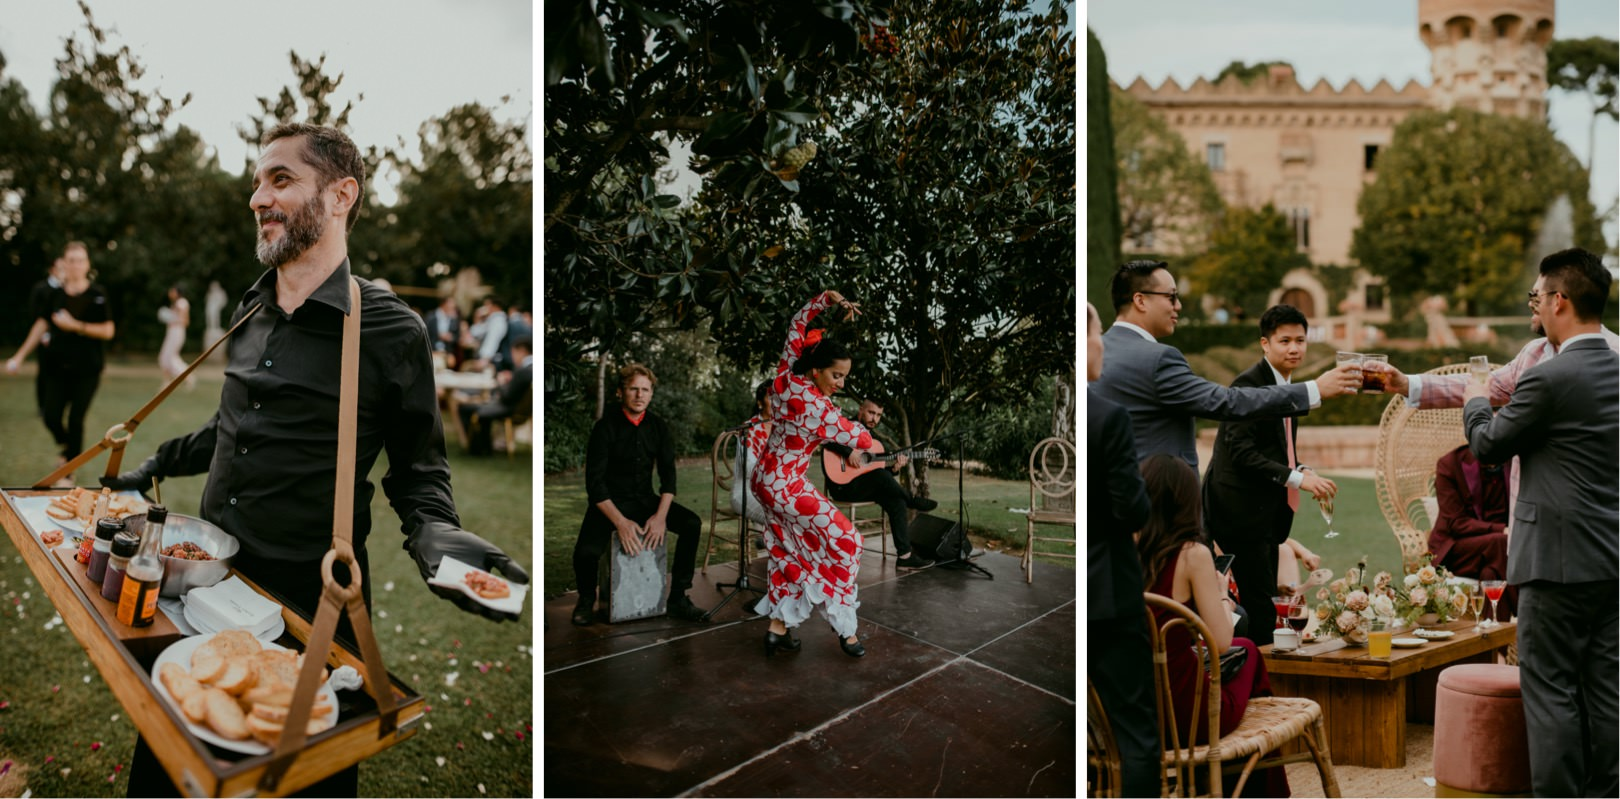 Luxury wedding at Castell de Sant Marcal wedding venue